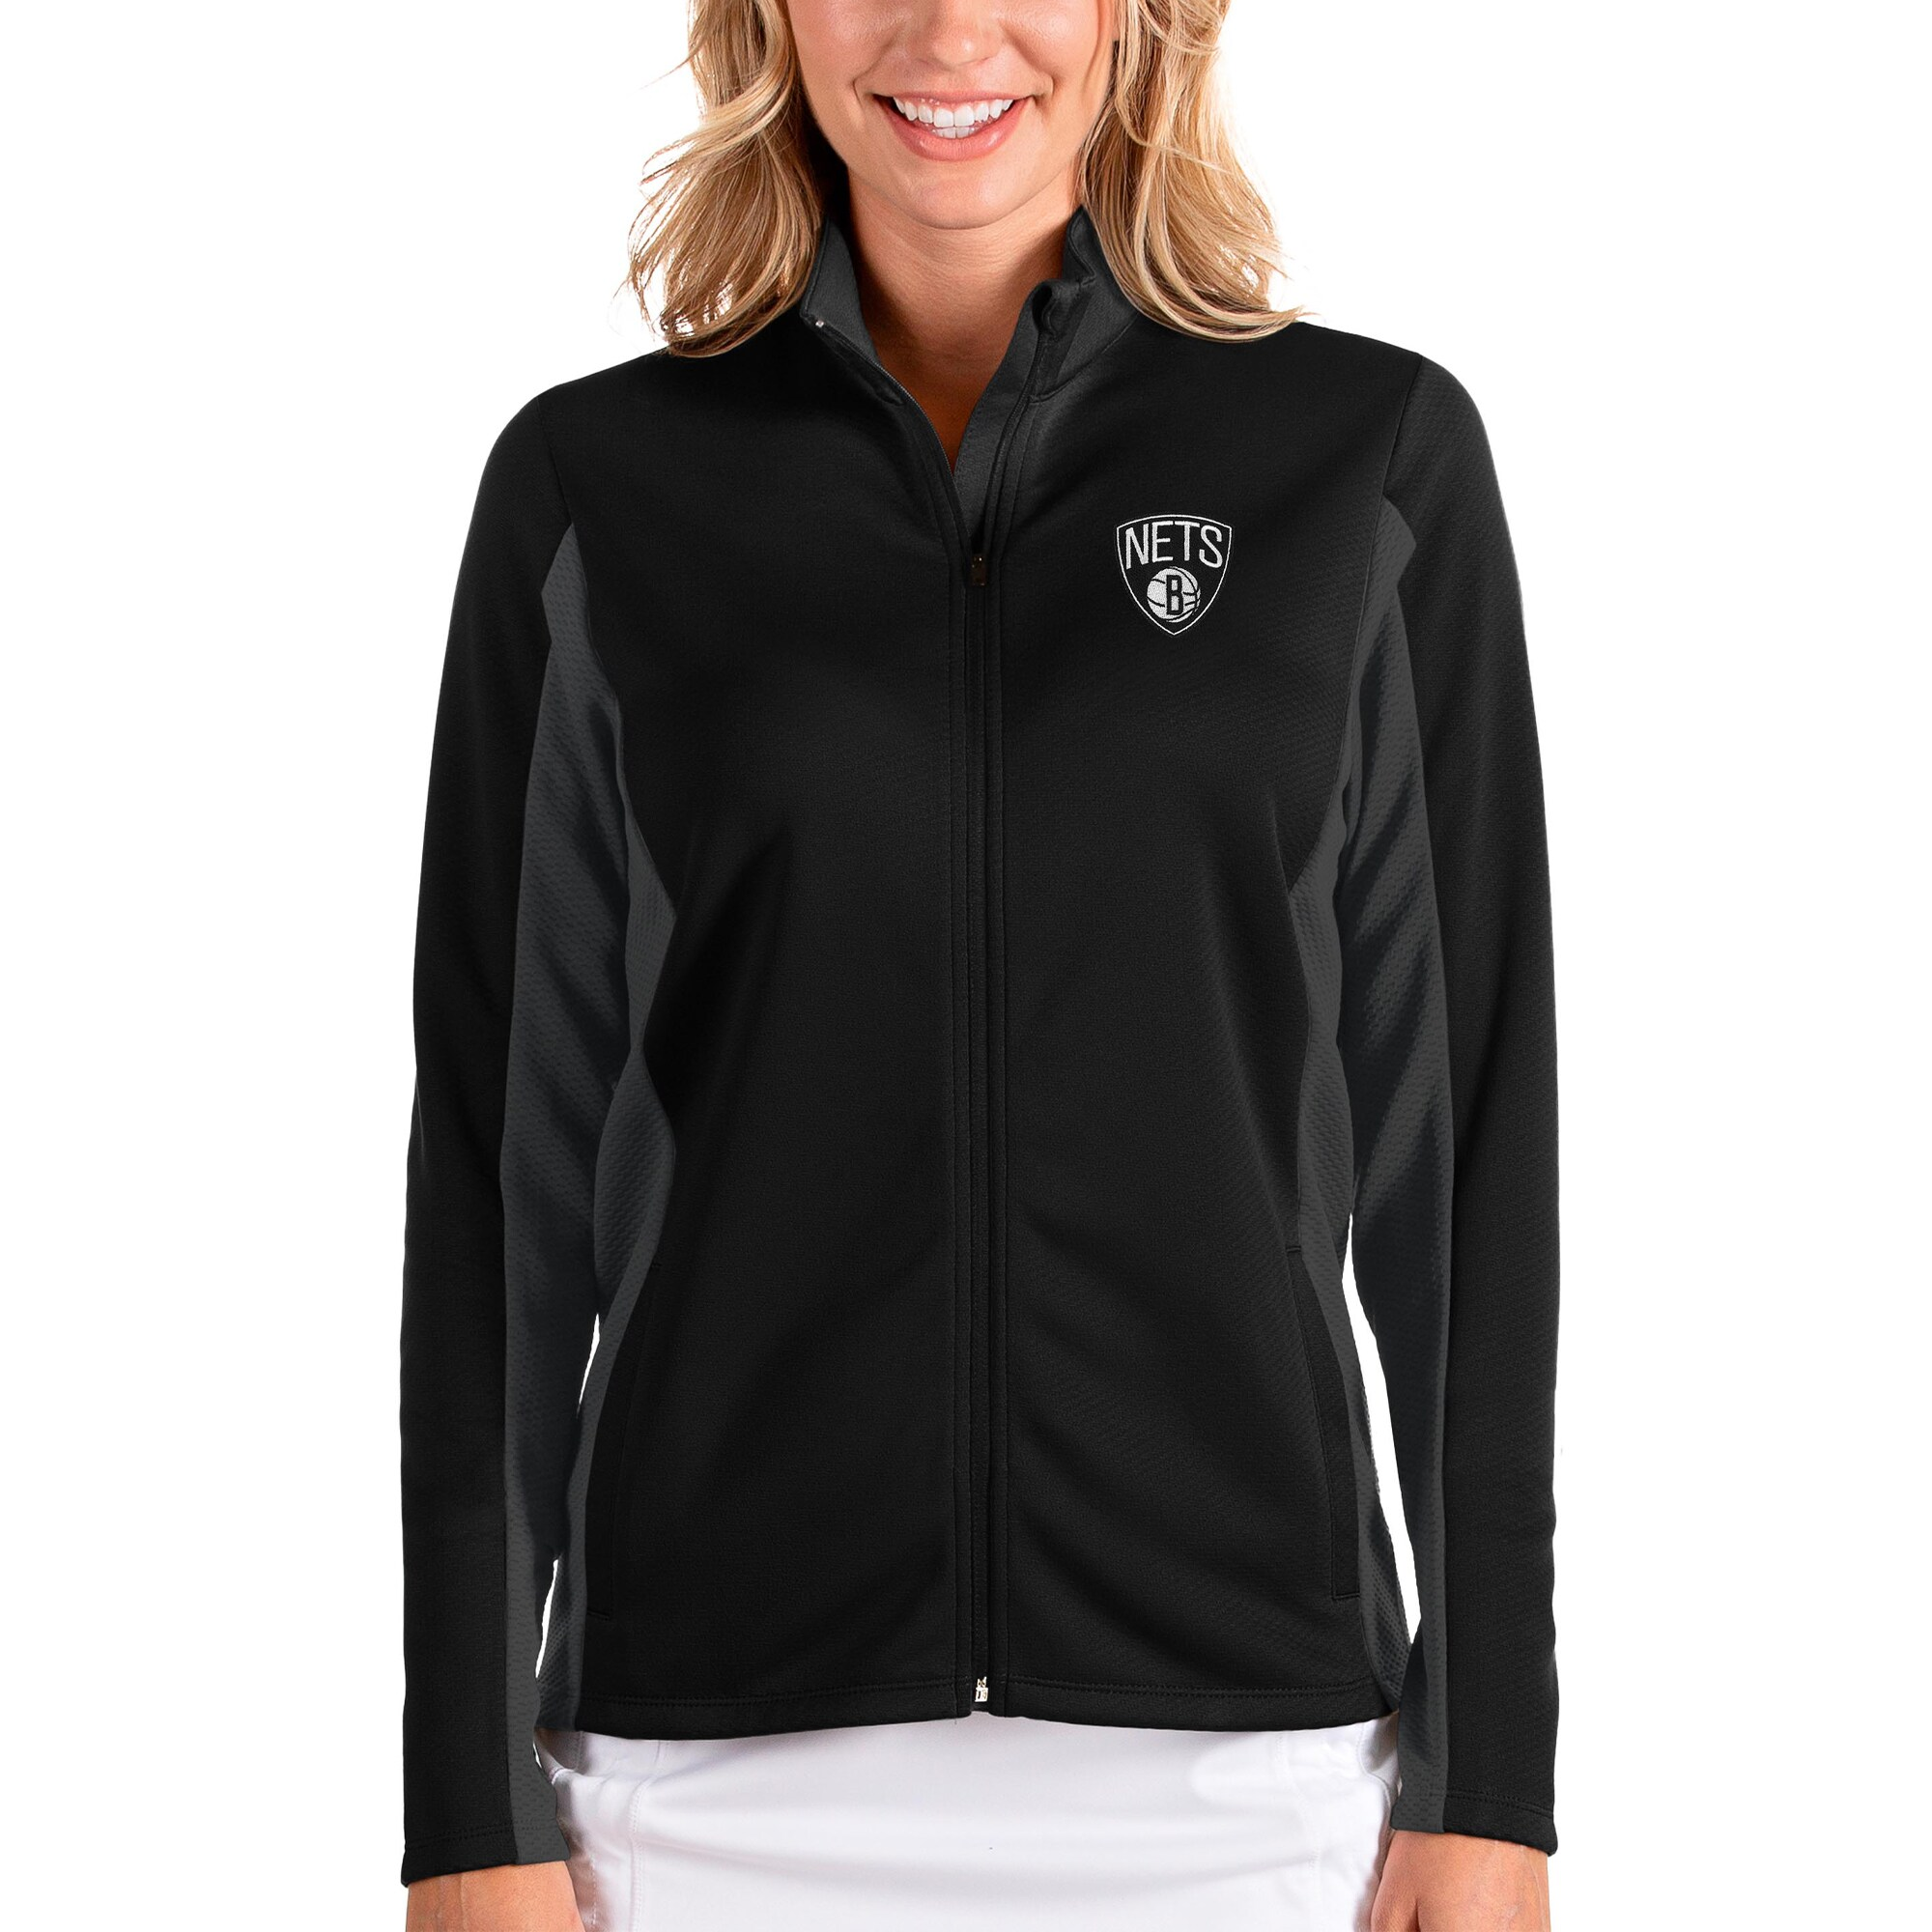 Brooklyn Nets Antigua Women's Passage Full-Zip Jacket - Black/Charcoal